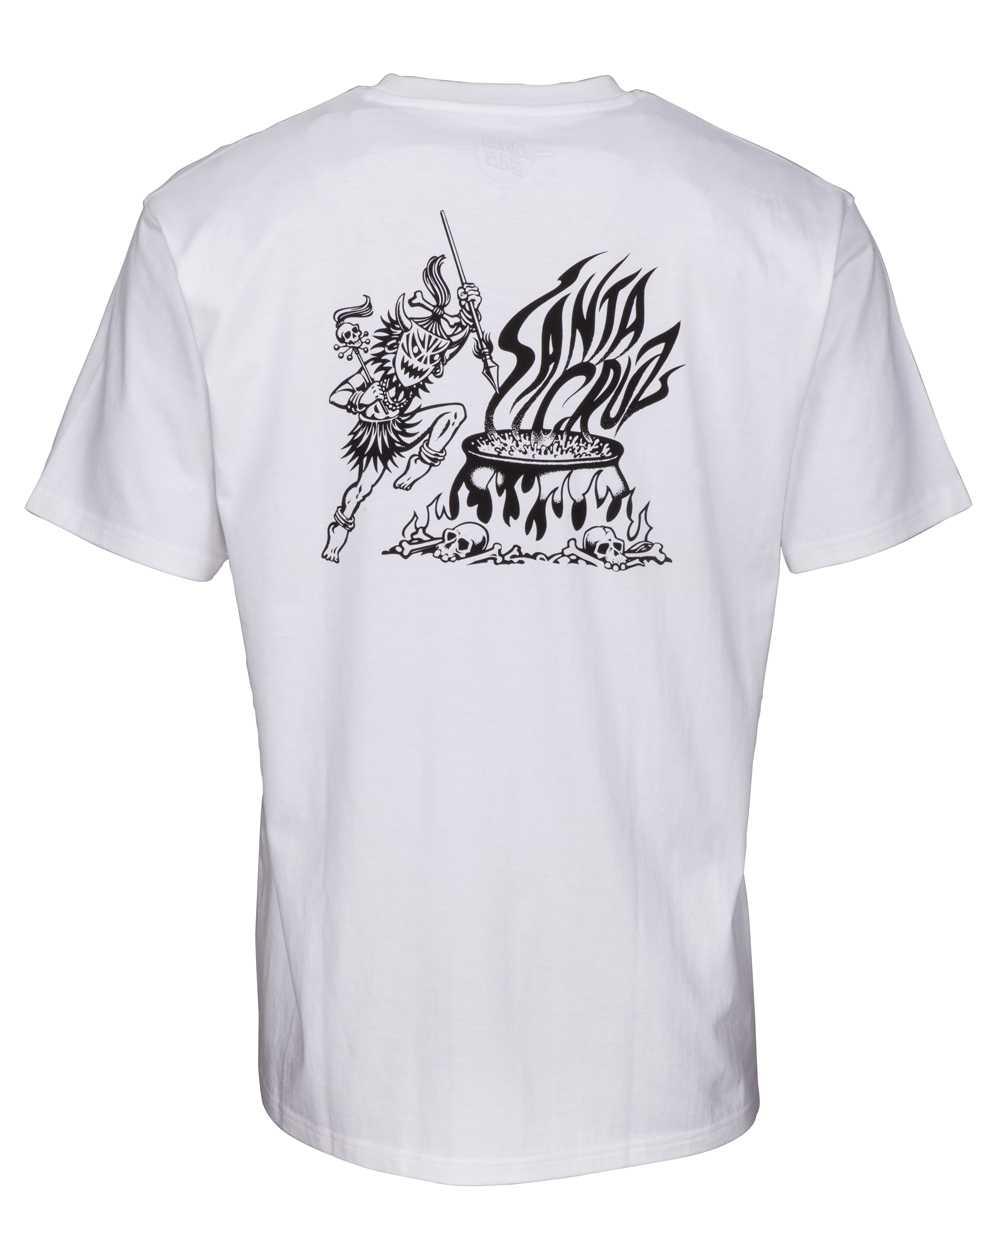 Santa Cruz Herren T-Shirt Salba Witch Doctor White